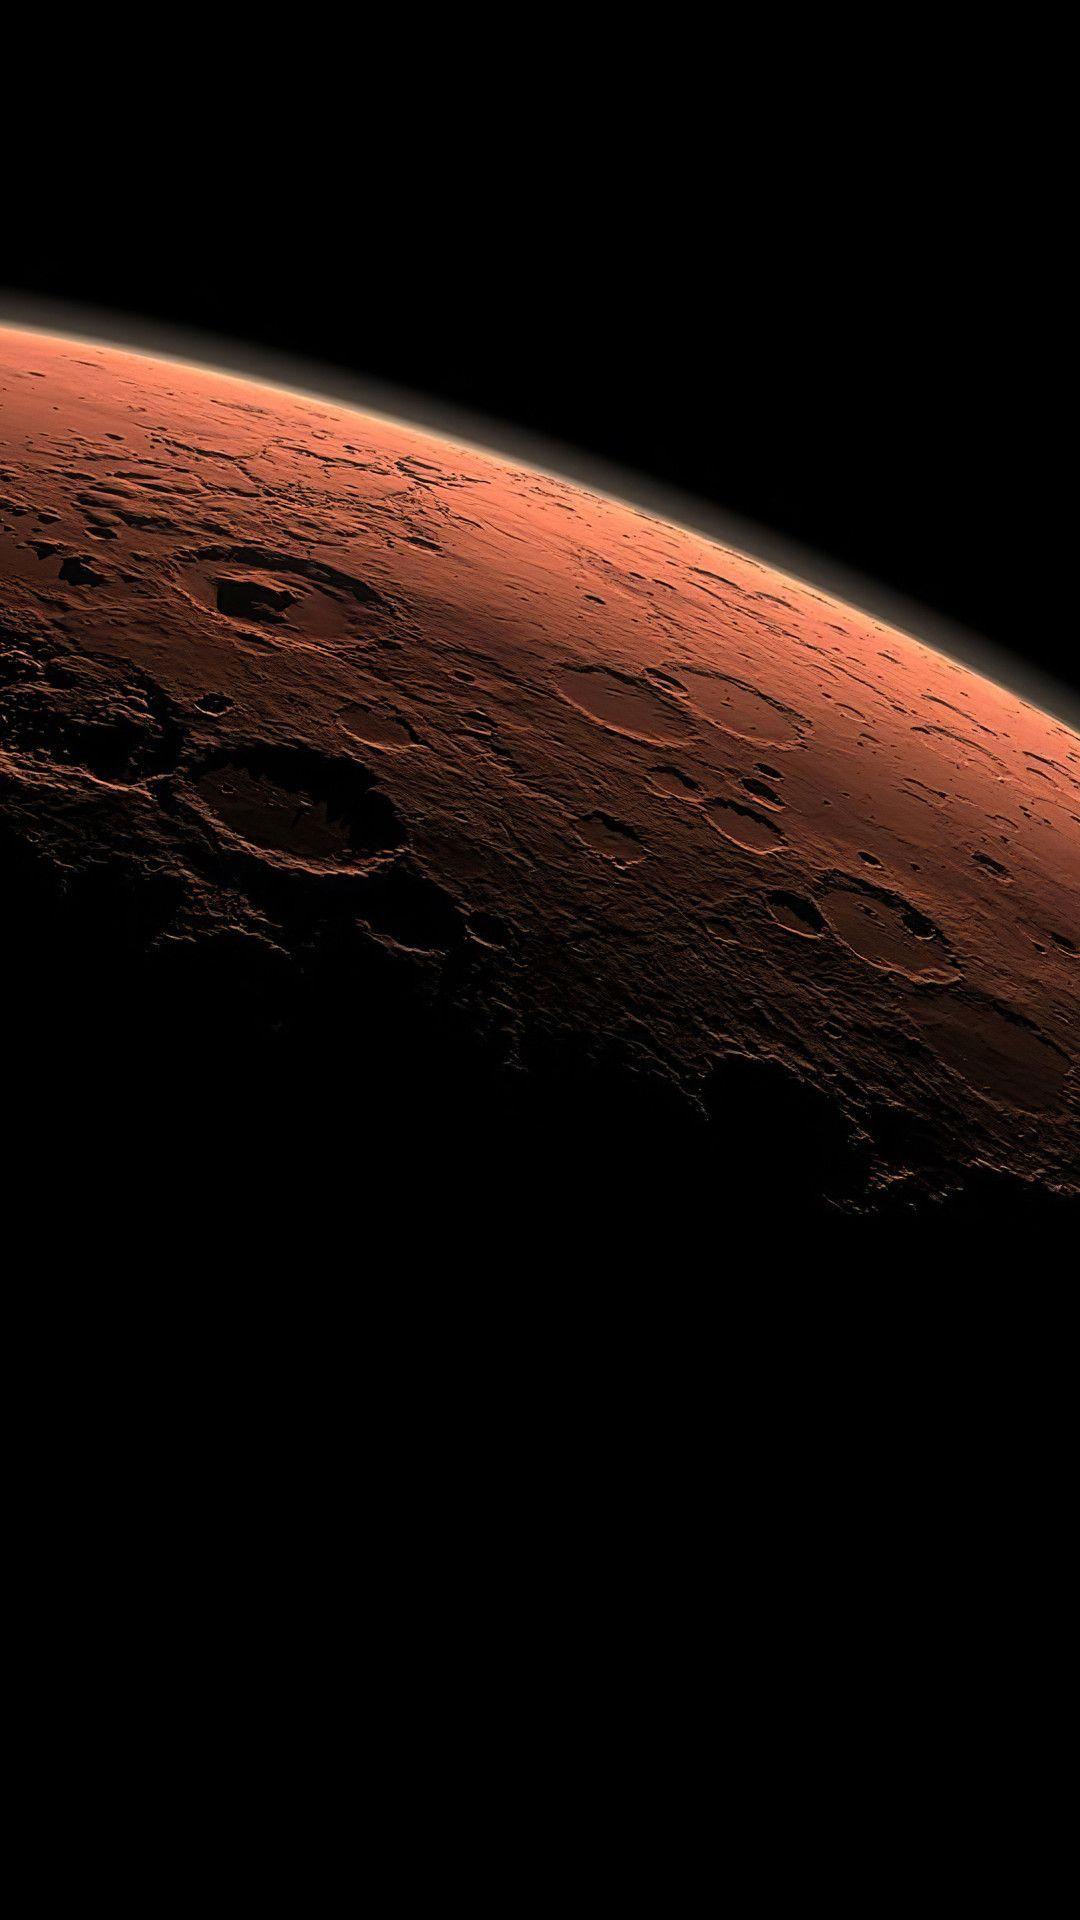 Mars Planet View 4k Mobile Wallpaper Iphone Android Samsung Pixel Xiaomi Em 2020 Planetas Do Sistema Solar Planetas Sistema Solar